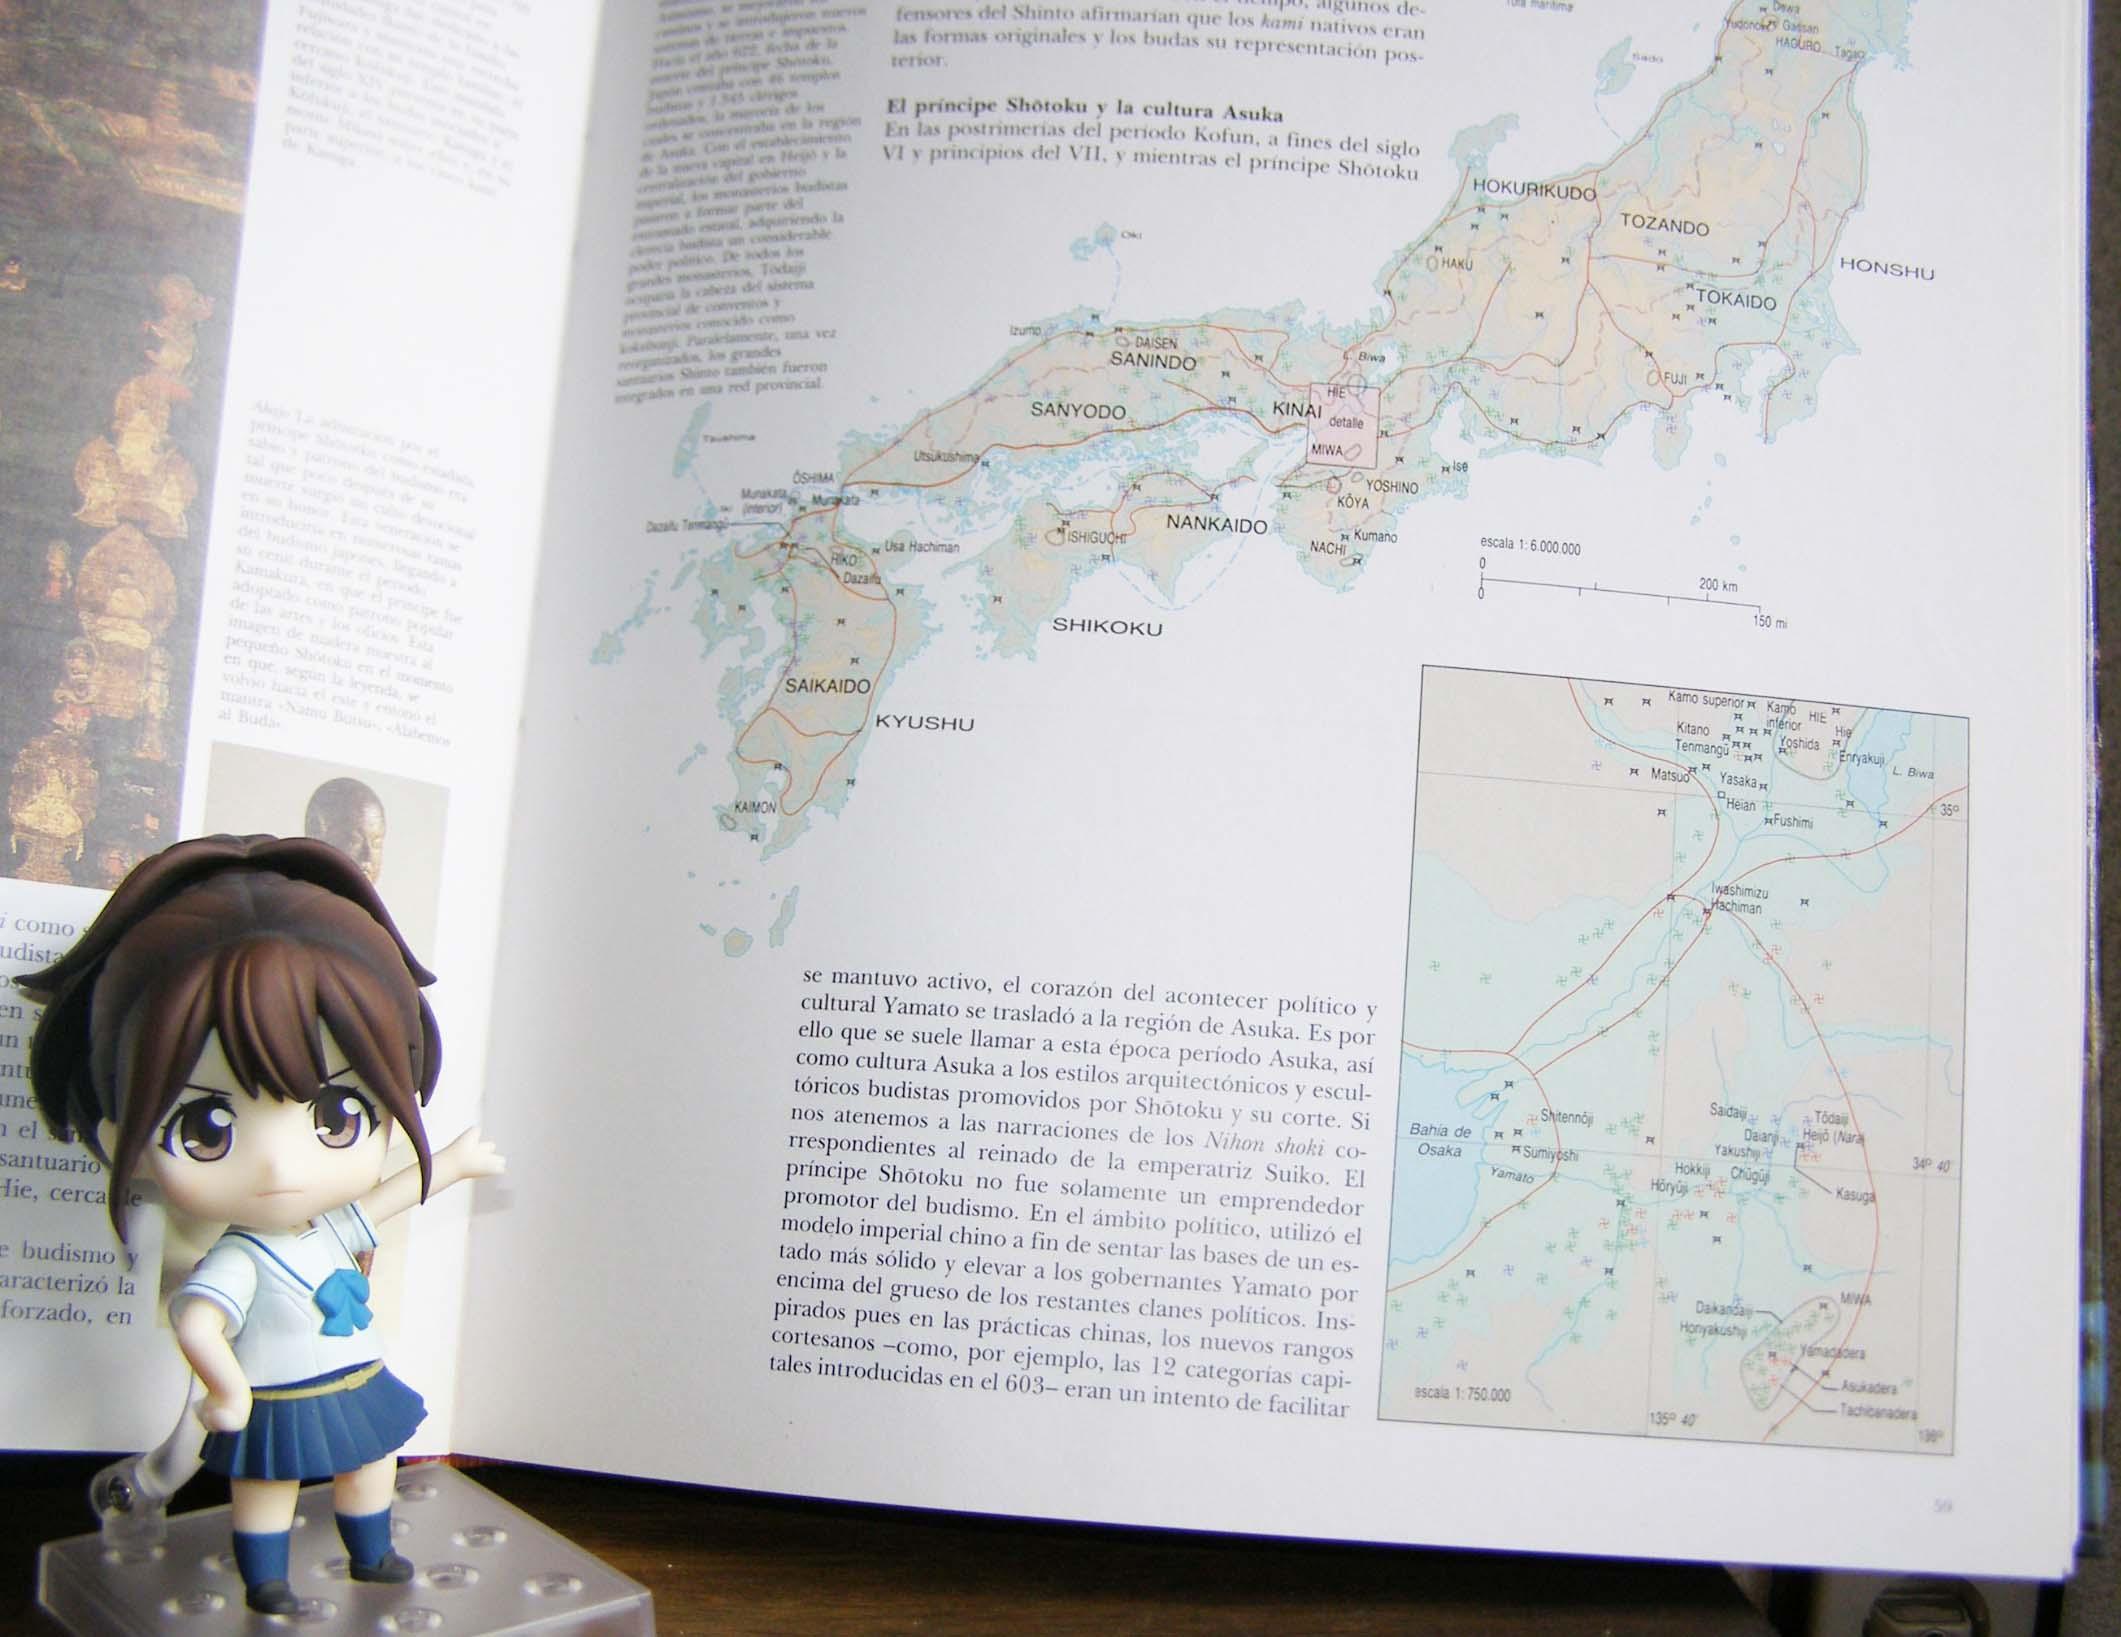 Japanese history 101 by teamblazeman